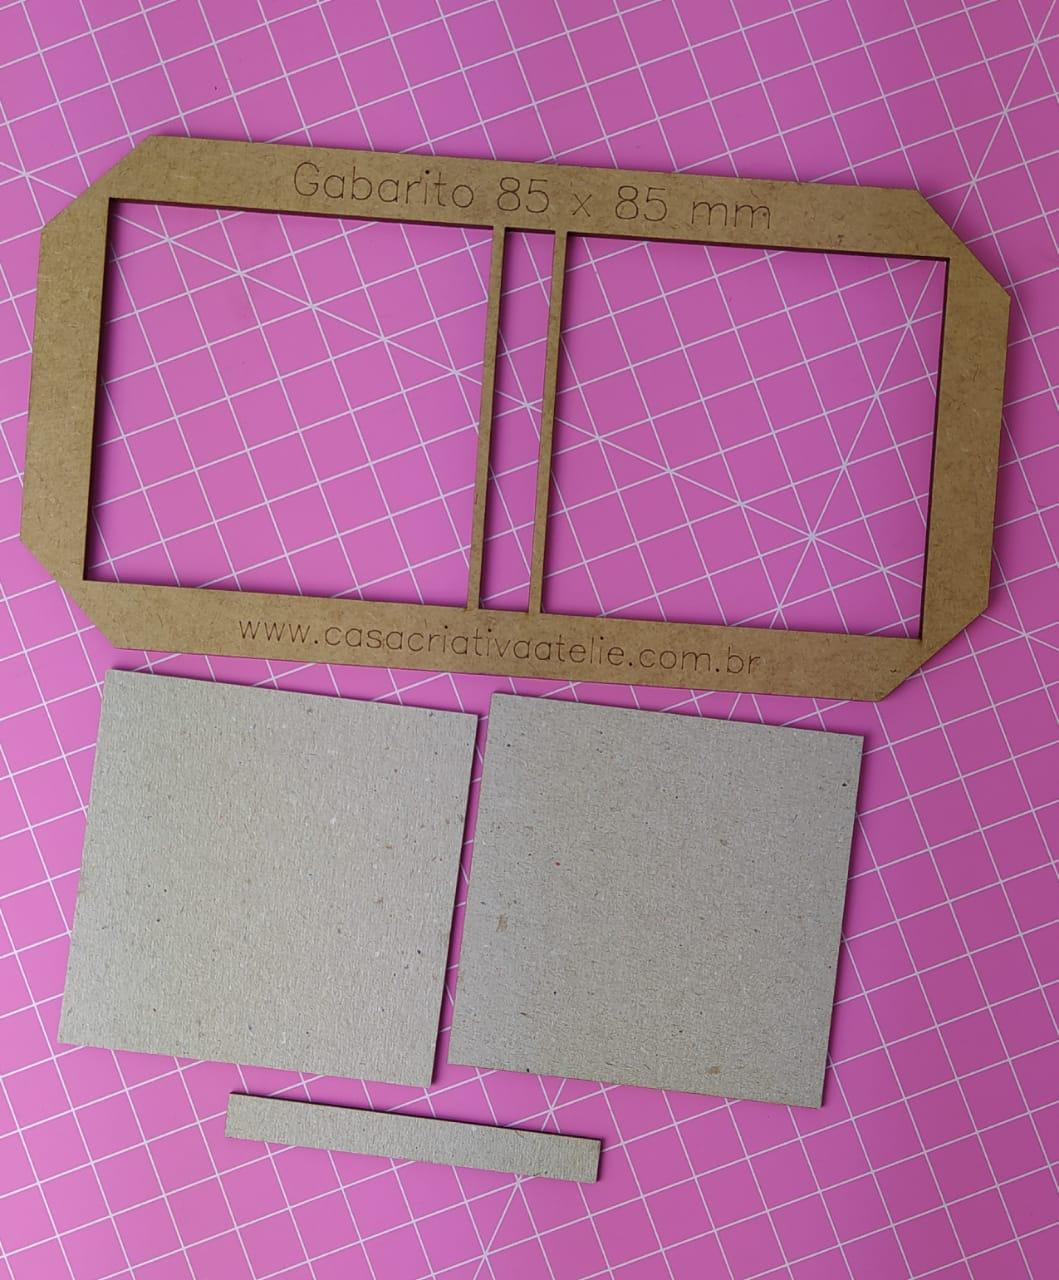 Kit Post it (Gabarito + 12 conjuntos de Papelão Cinza Tipo Holler) - 8,5 x 8,5 cm